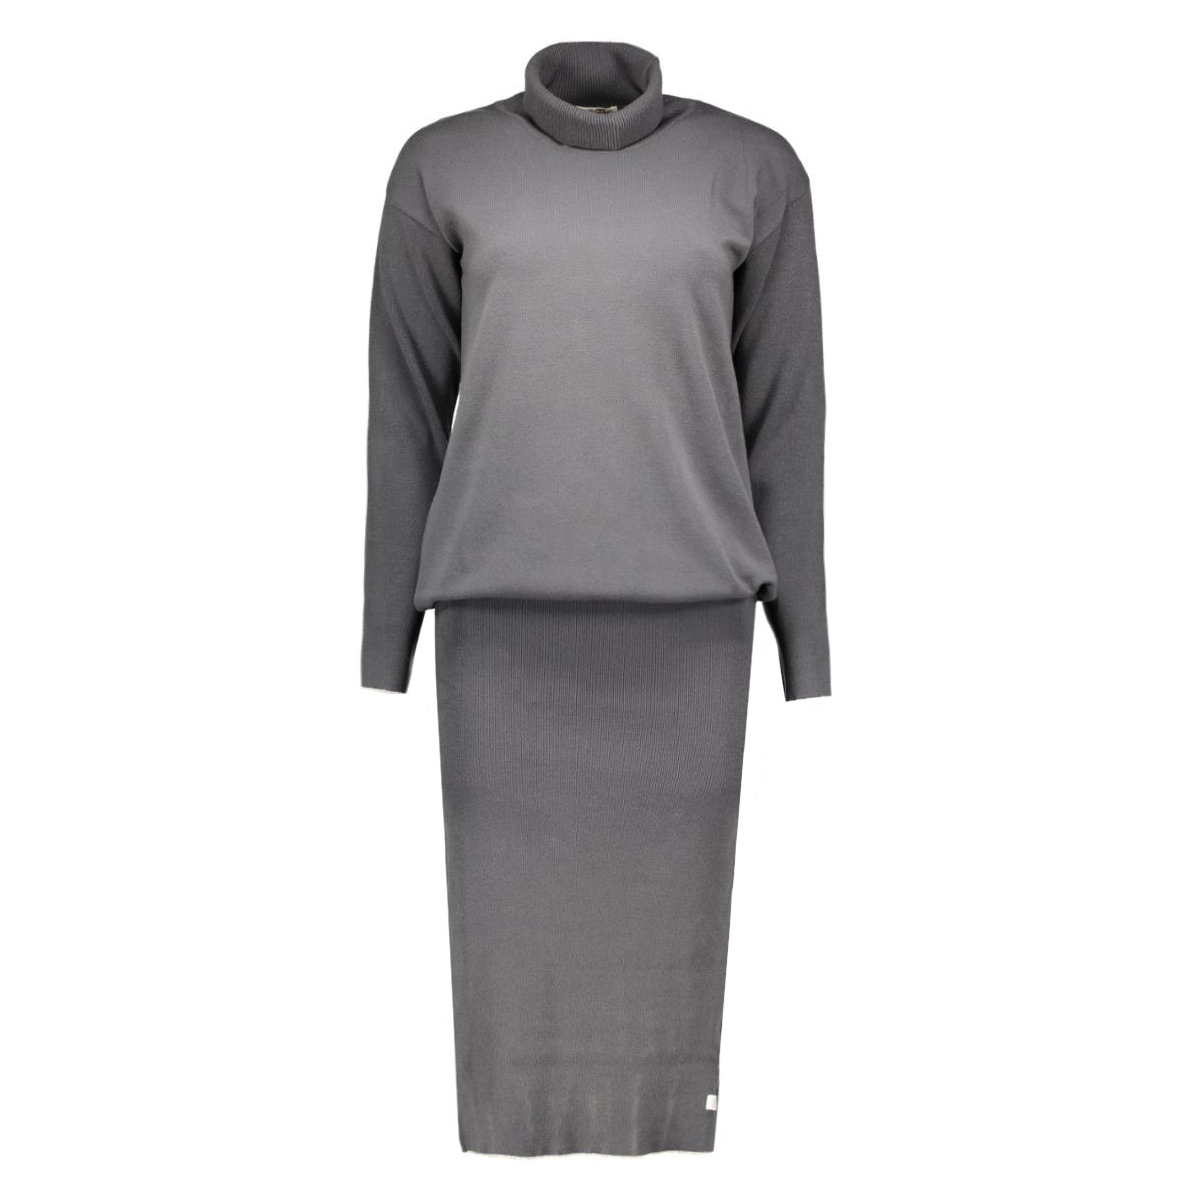 sarco cipria osi femmes jurk dark grey